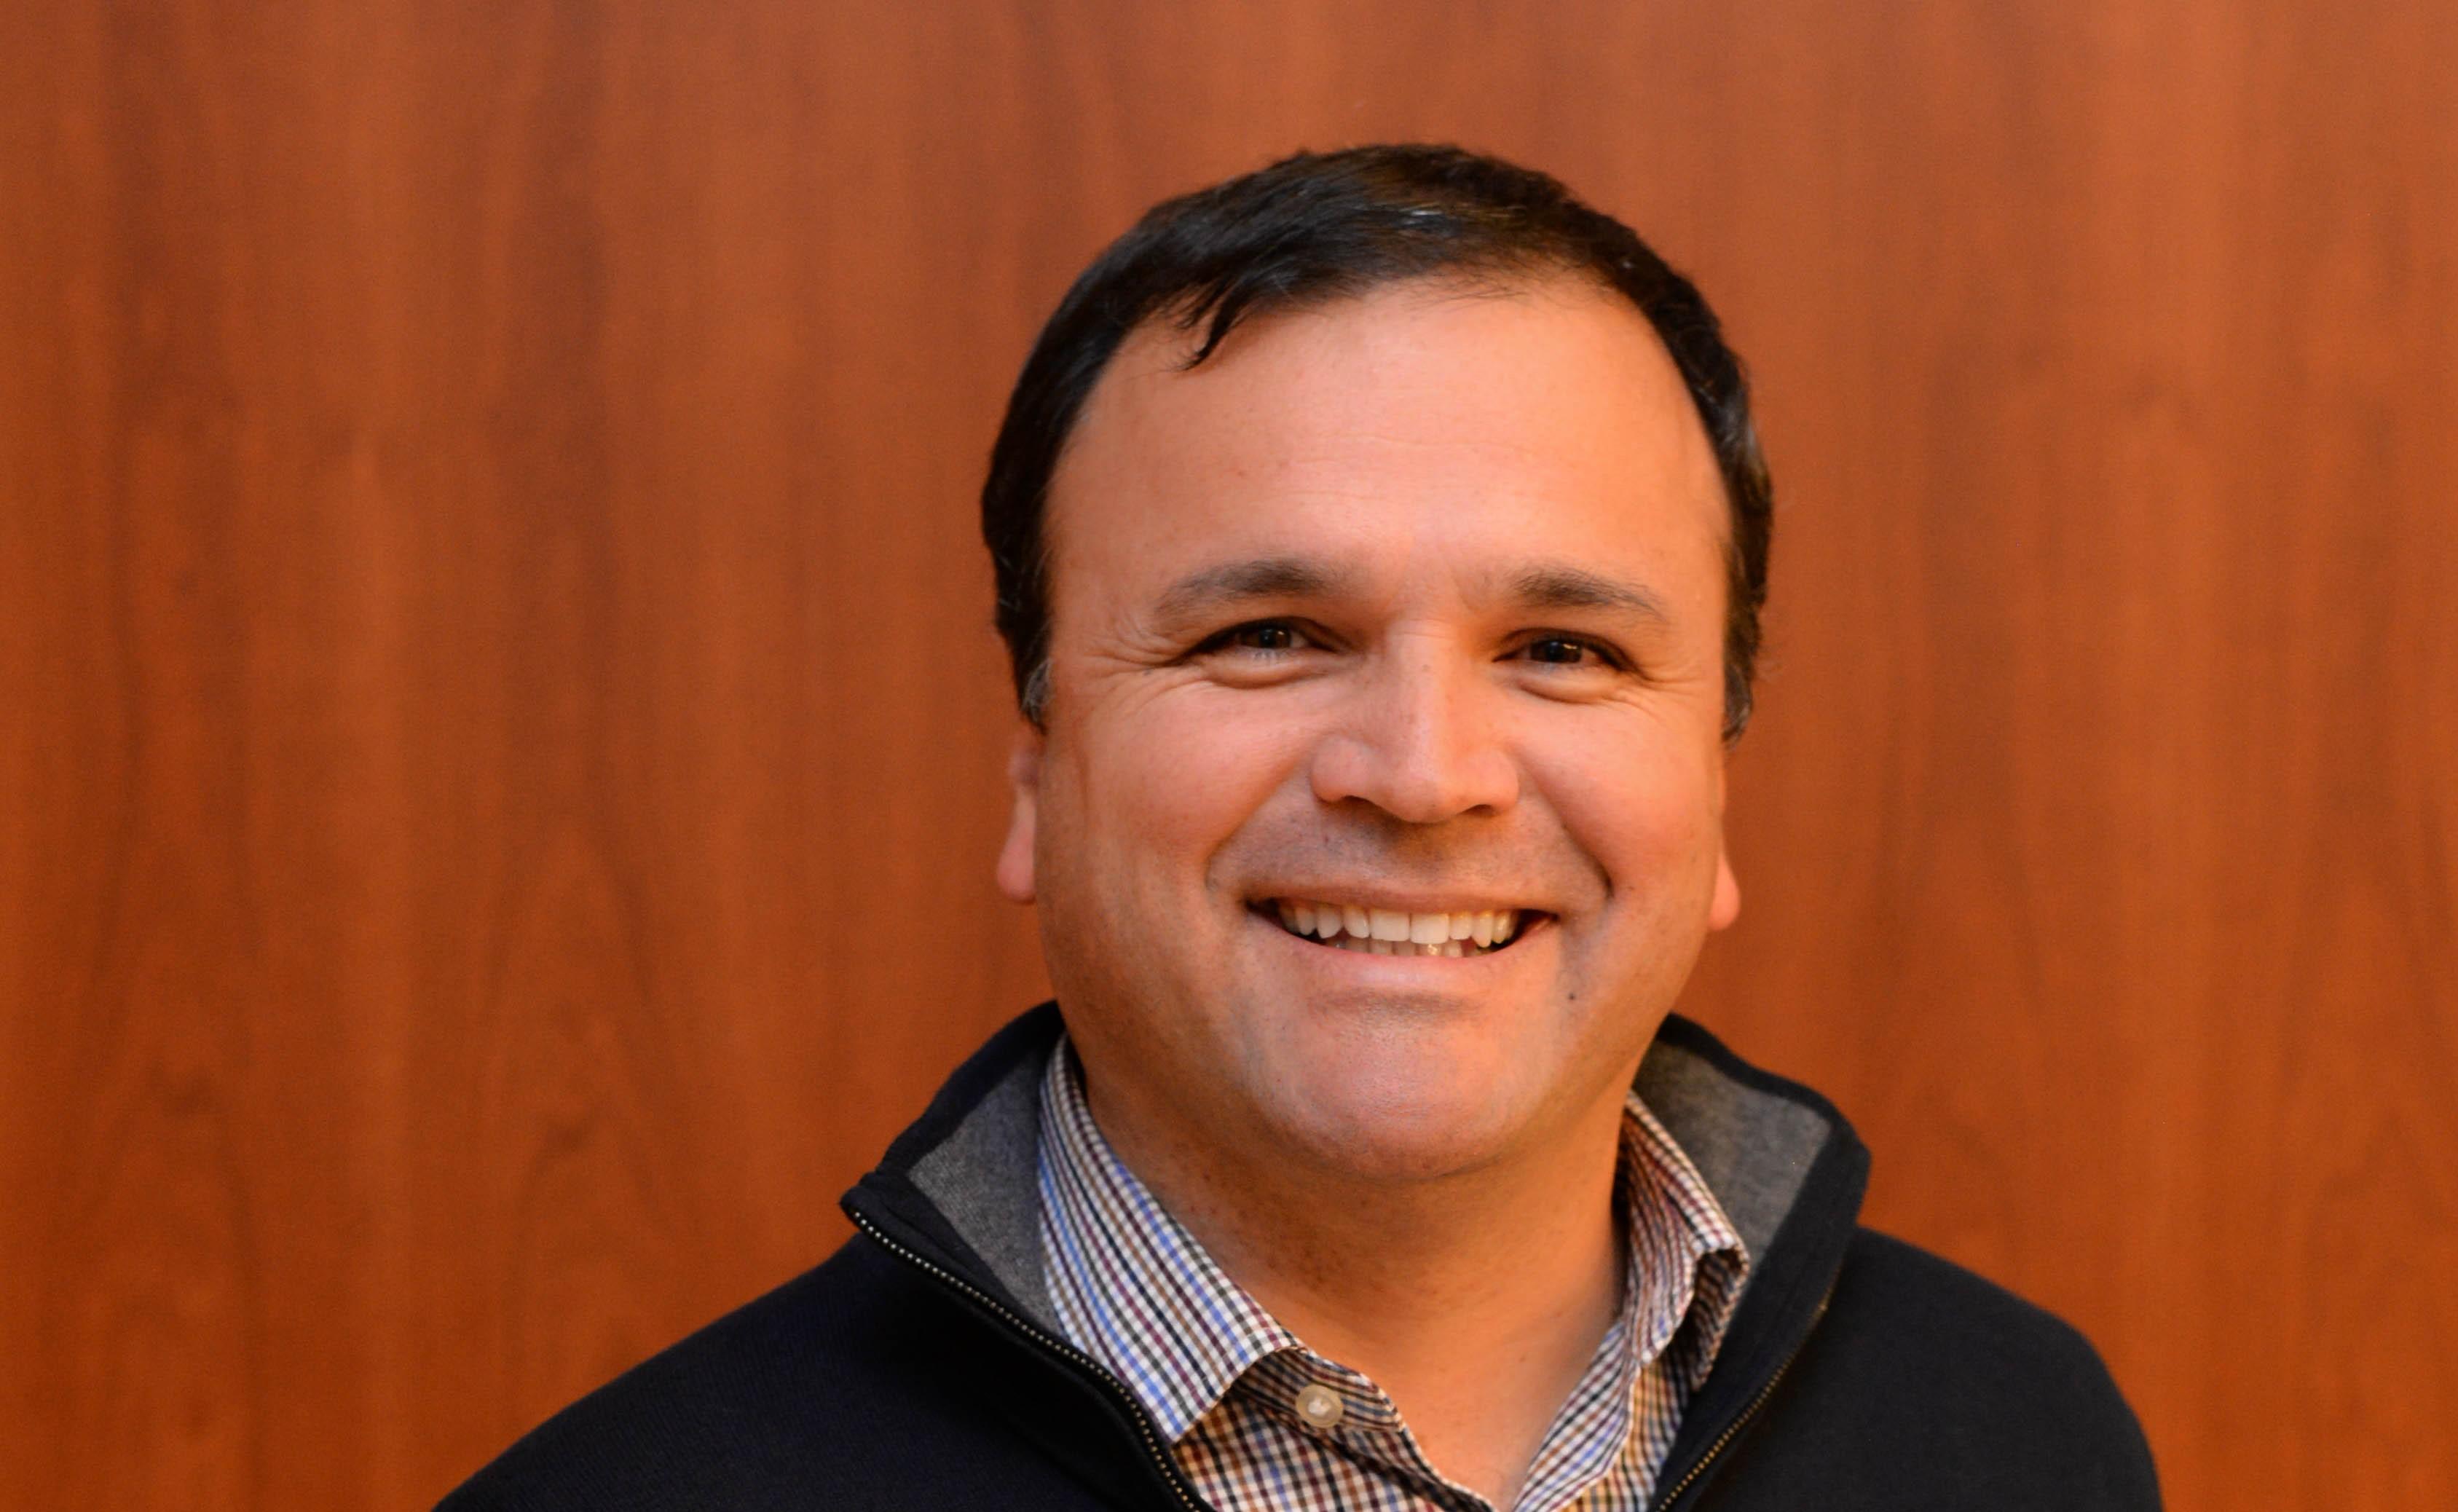 A headshot of Dr. Jimenez